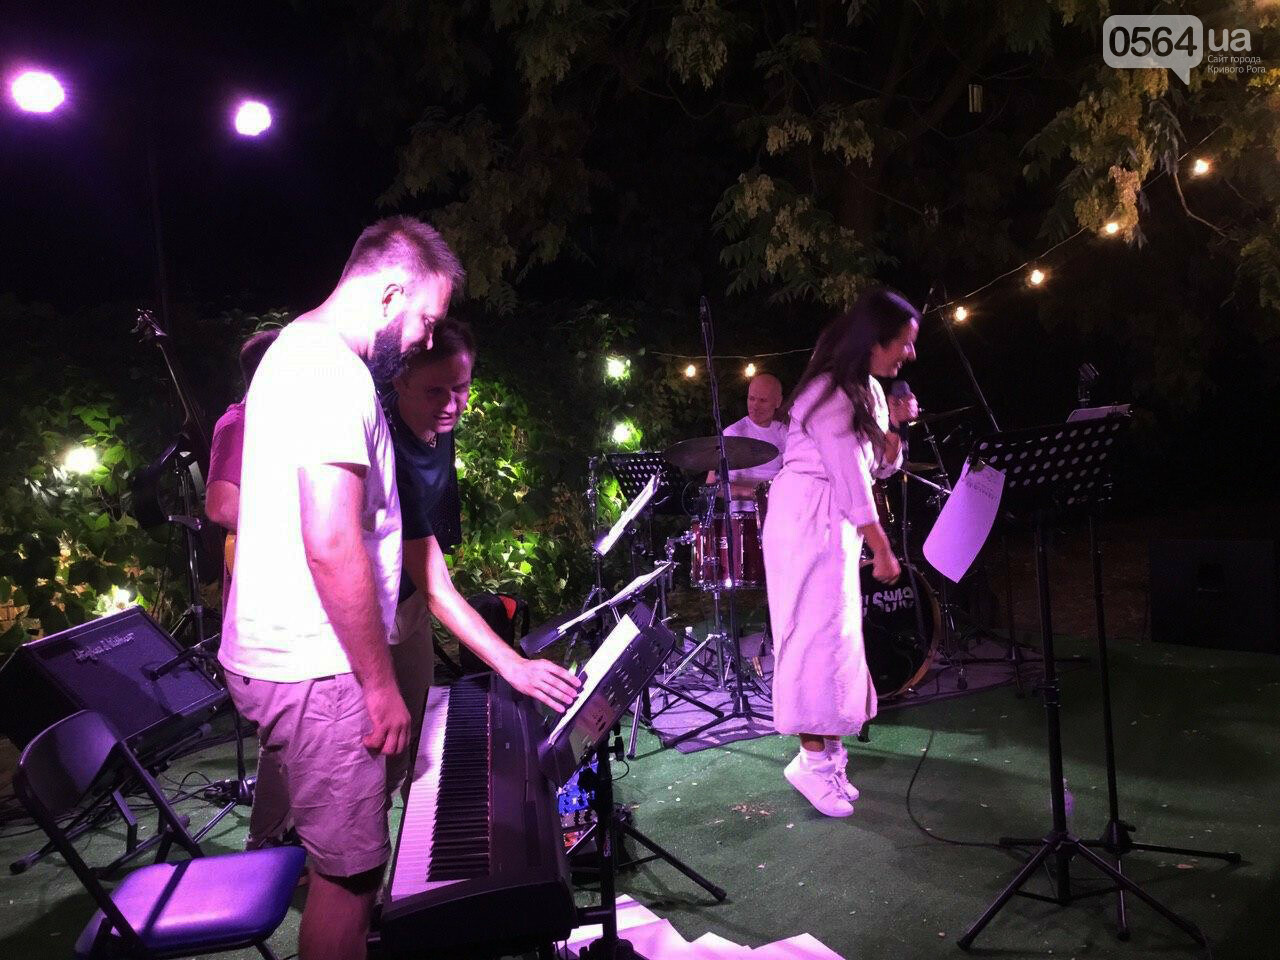 Под звездным небом криворожане наслаждались летним джазом от  Advantage Project, - ФОТО, ВИДЕО , фото-13